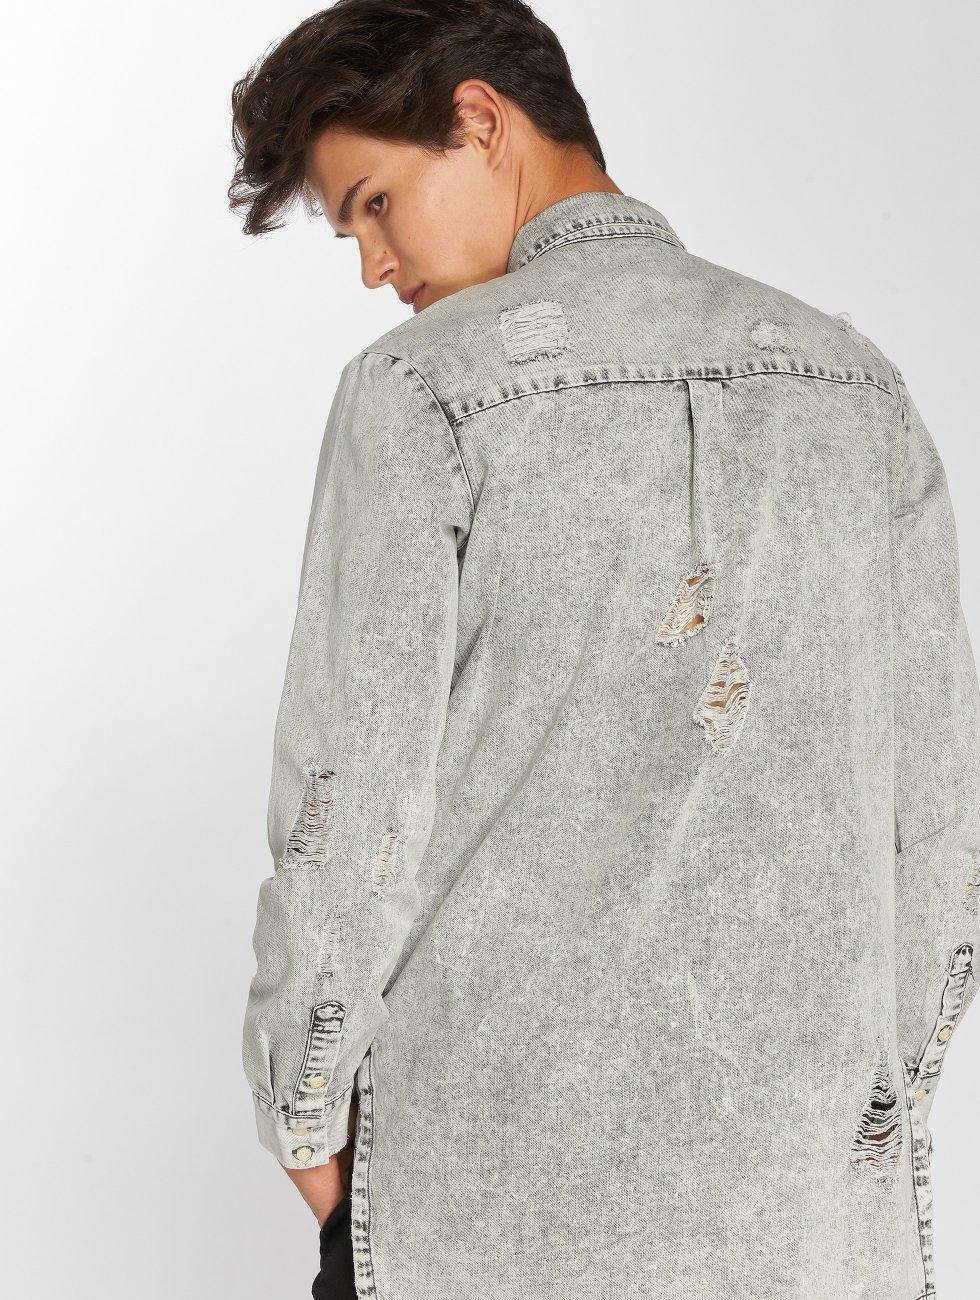 Sixth June Shirt Destroyed gray